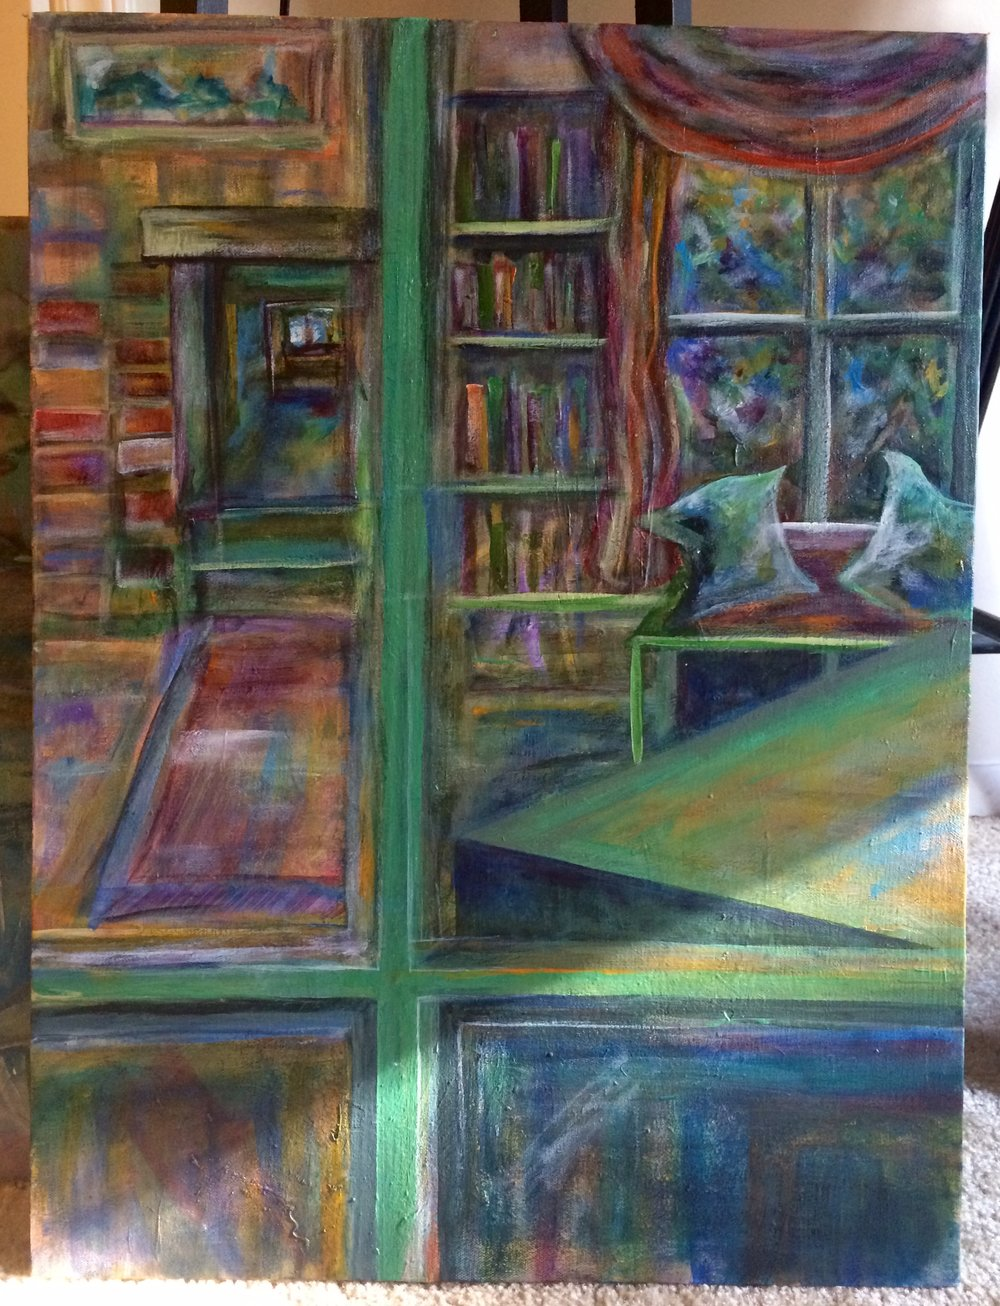 Reception for acrylic artist madeleine murray at caffe driade 2nd friday artwalk - Cafe driade ...